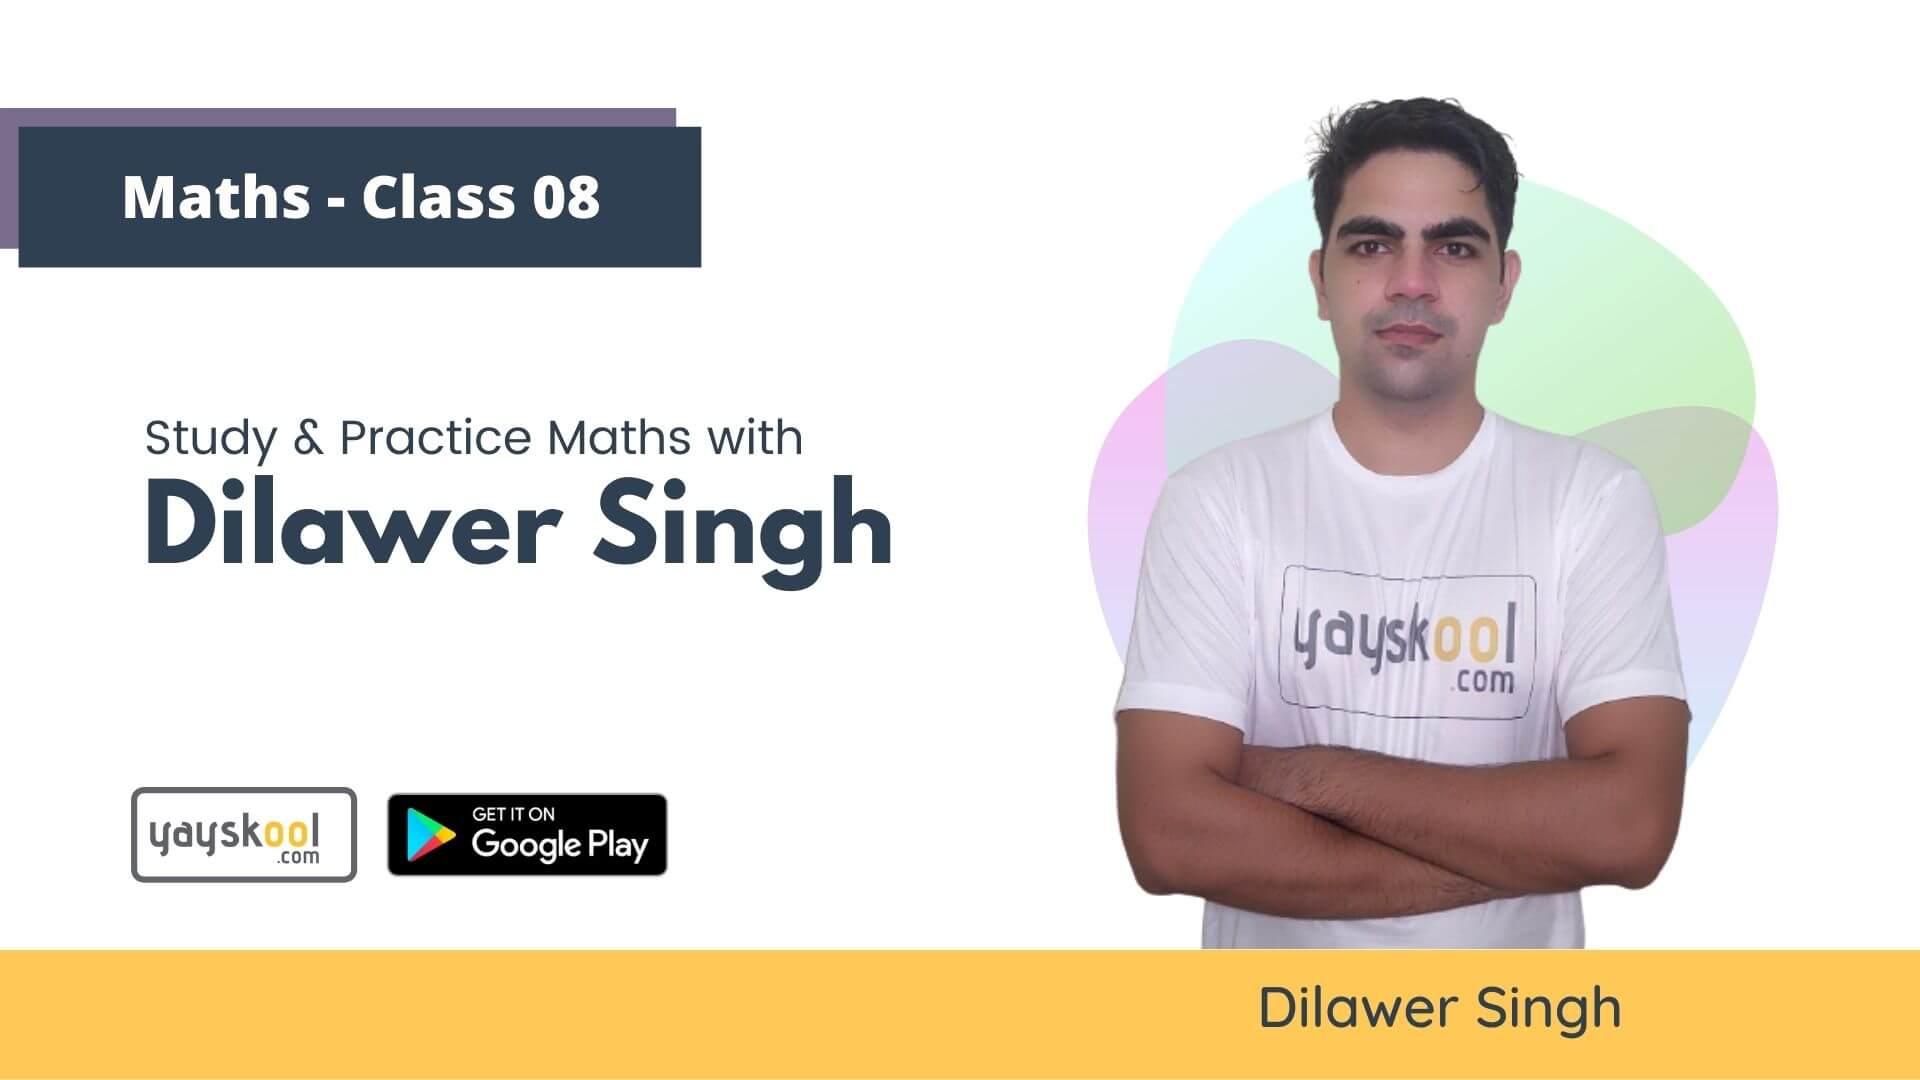 maths-dilawer-singh-class08